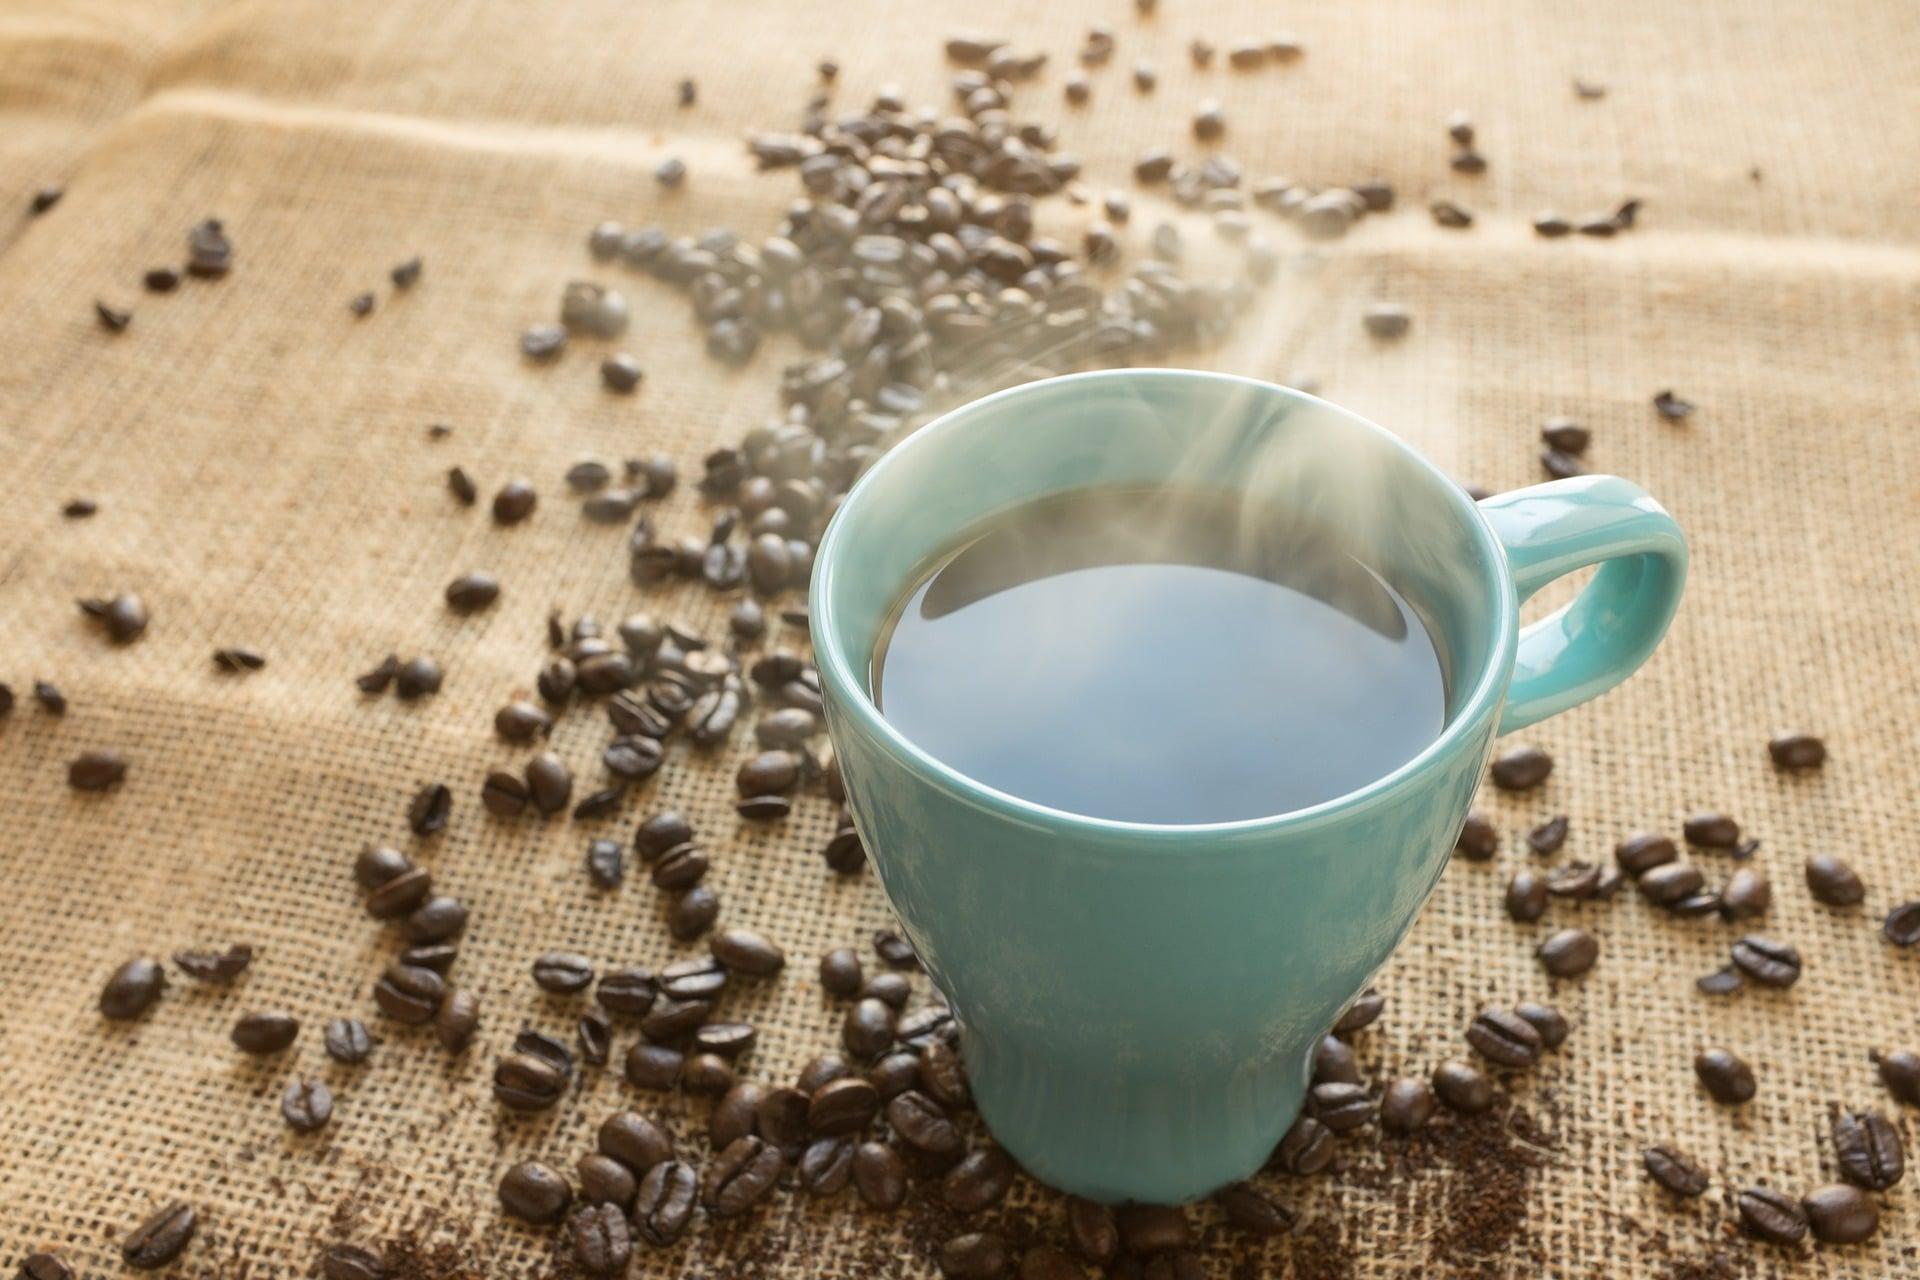 Coffee Statistics - Consumption